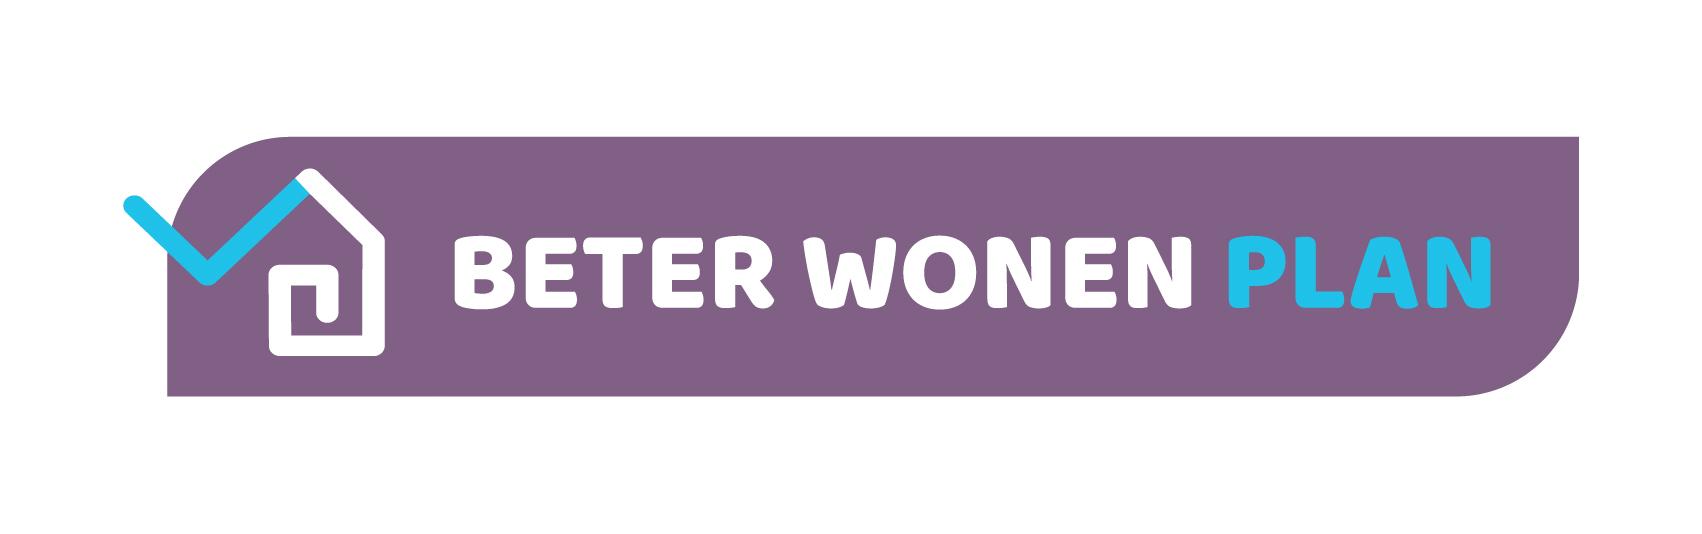 Beter-Wonen-Plan_Logo_DEF_747_.jpg